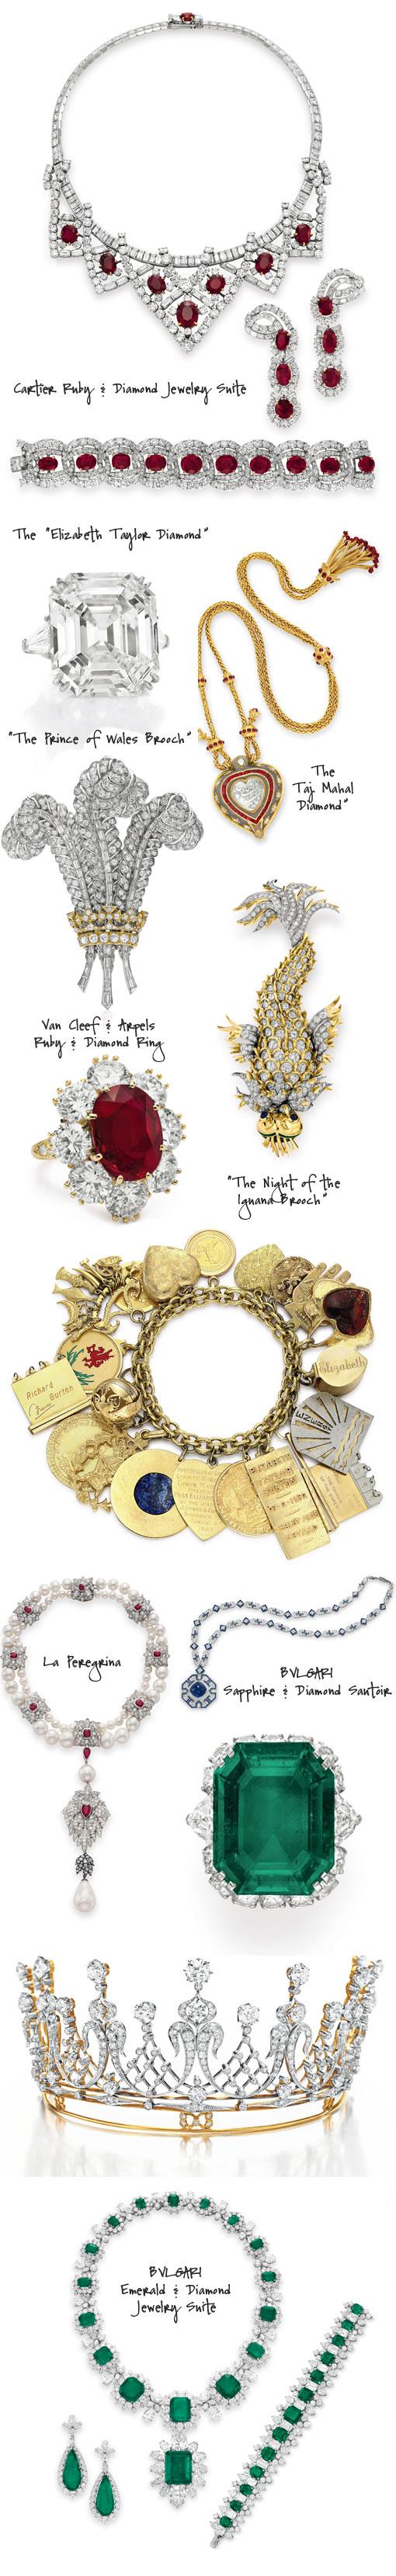 Elizabeth Taylor Jewelry Auction : elizabeth, taylor, jewelry, auction, Hollywood, Royalty:The, Elizabeth, Taylor, Jewelry, Collection, Exhibit, Auction